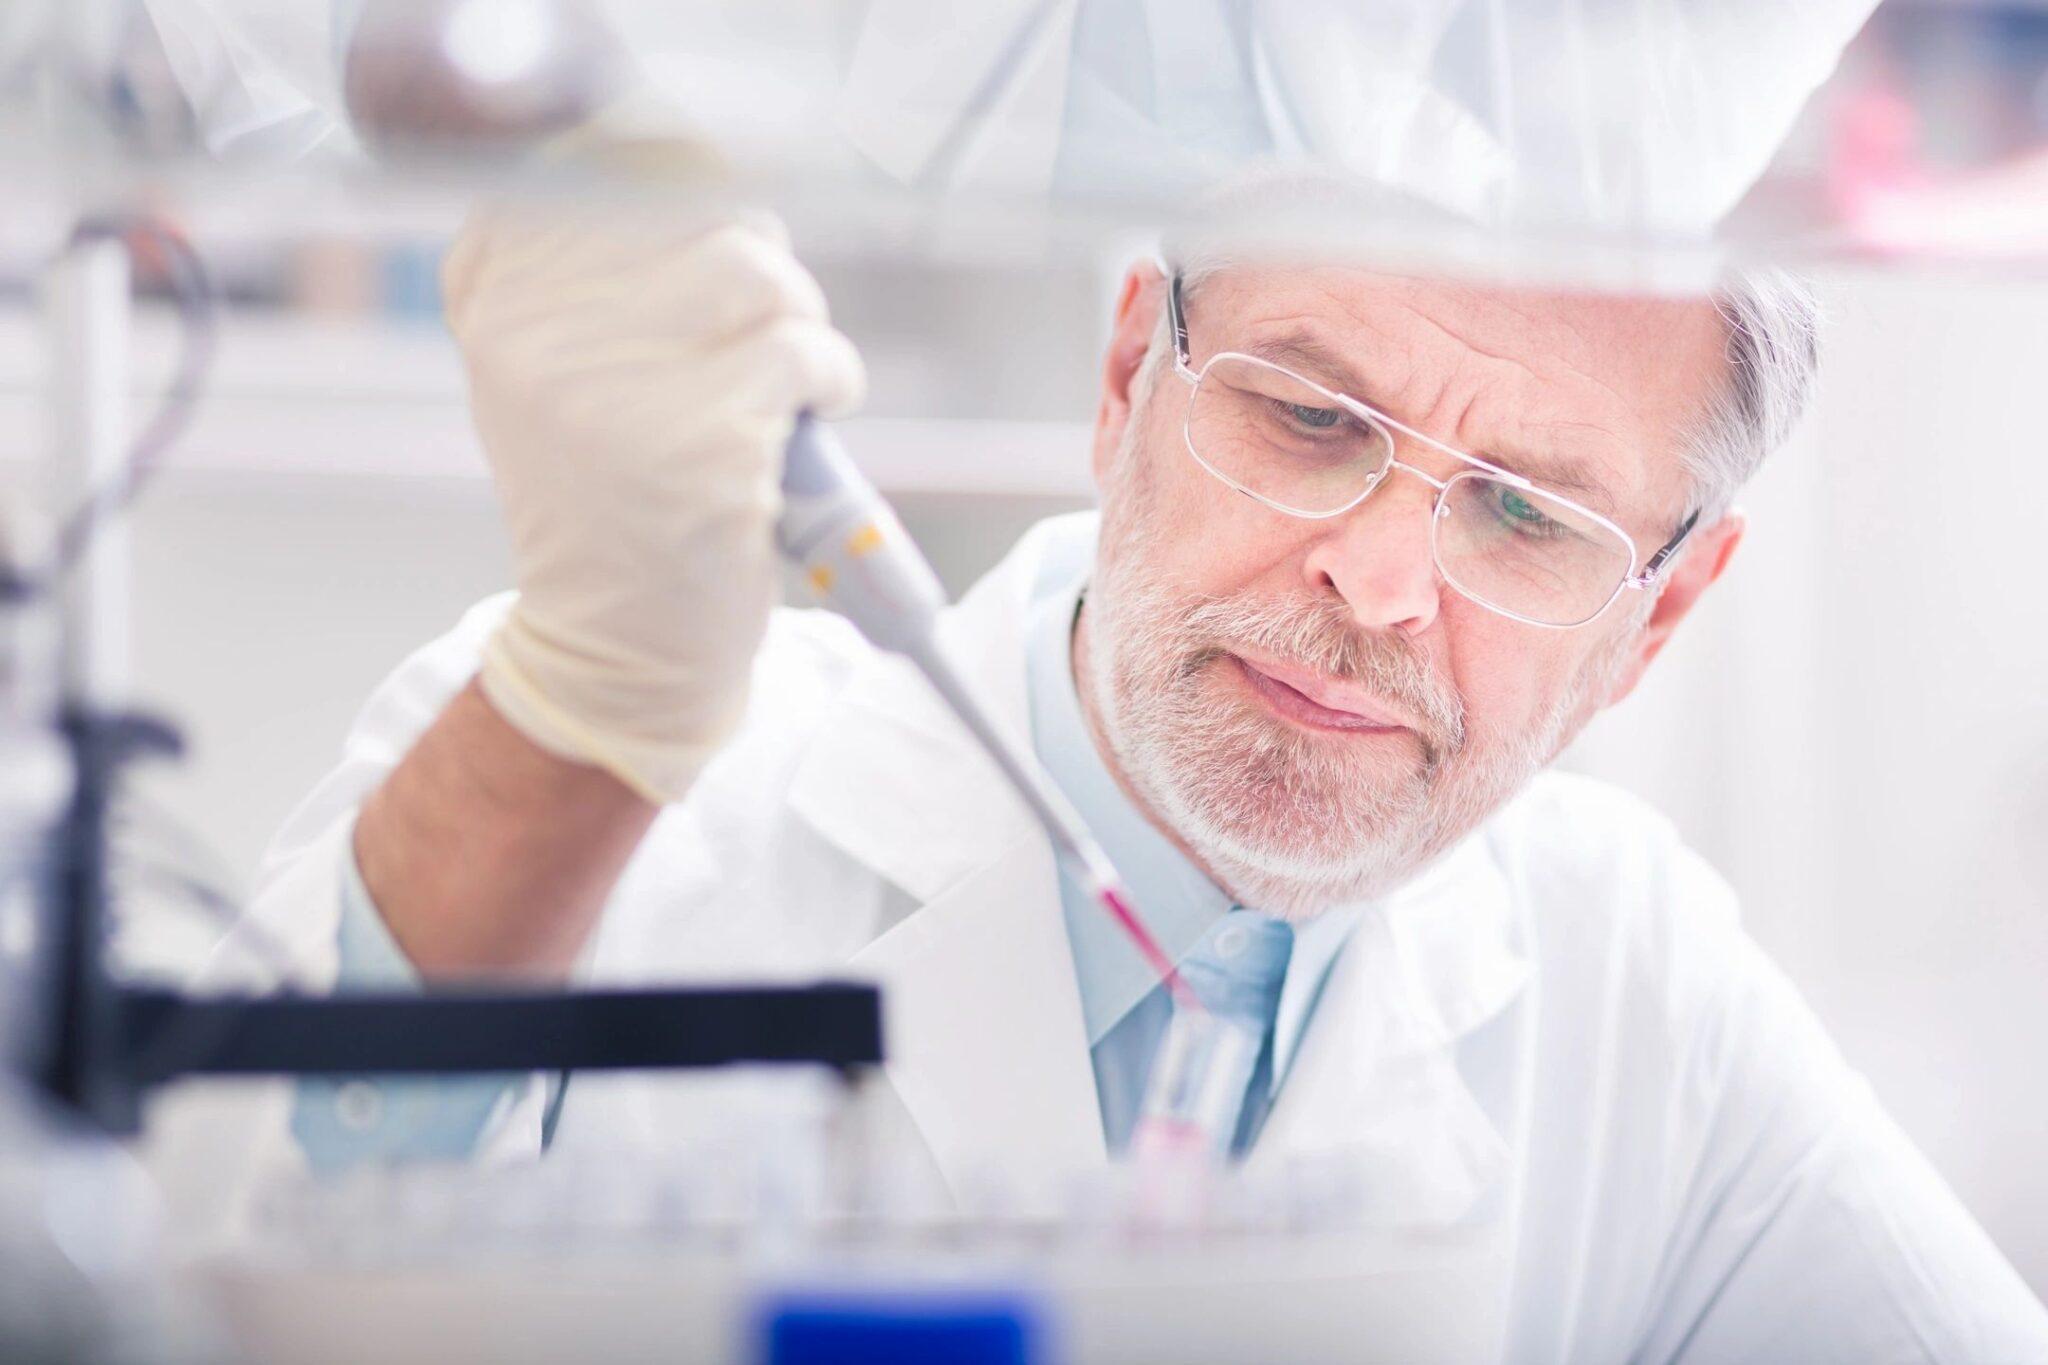 male bias in medicine harms women